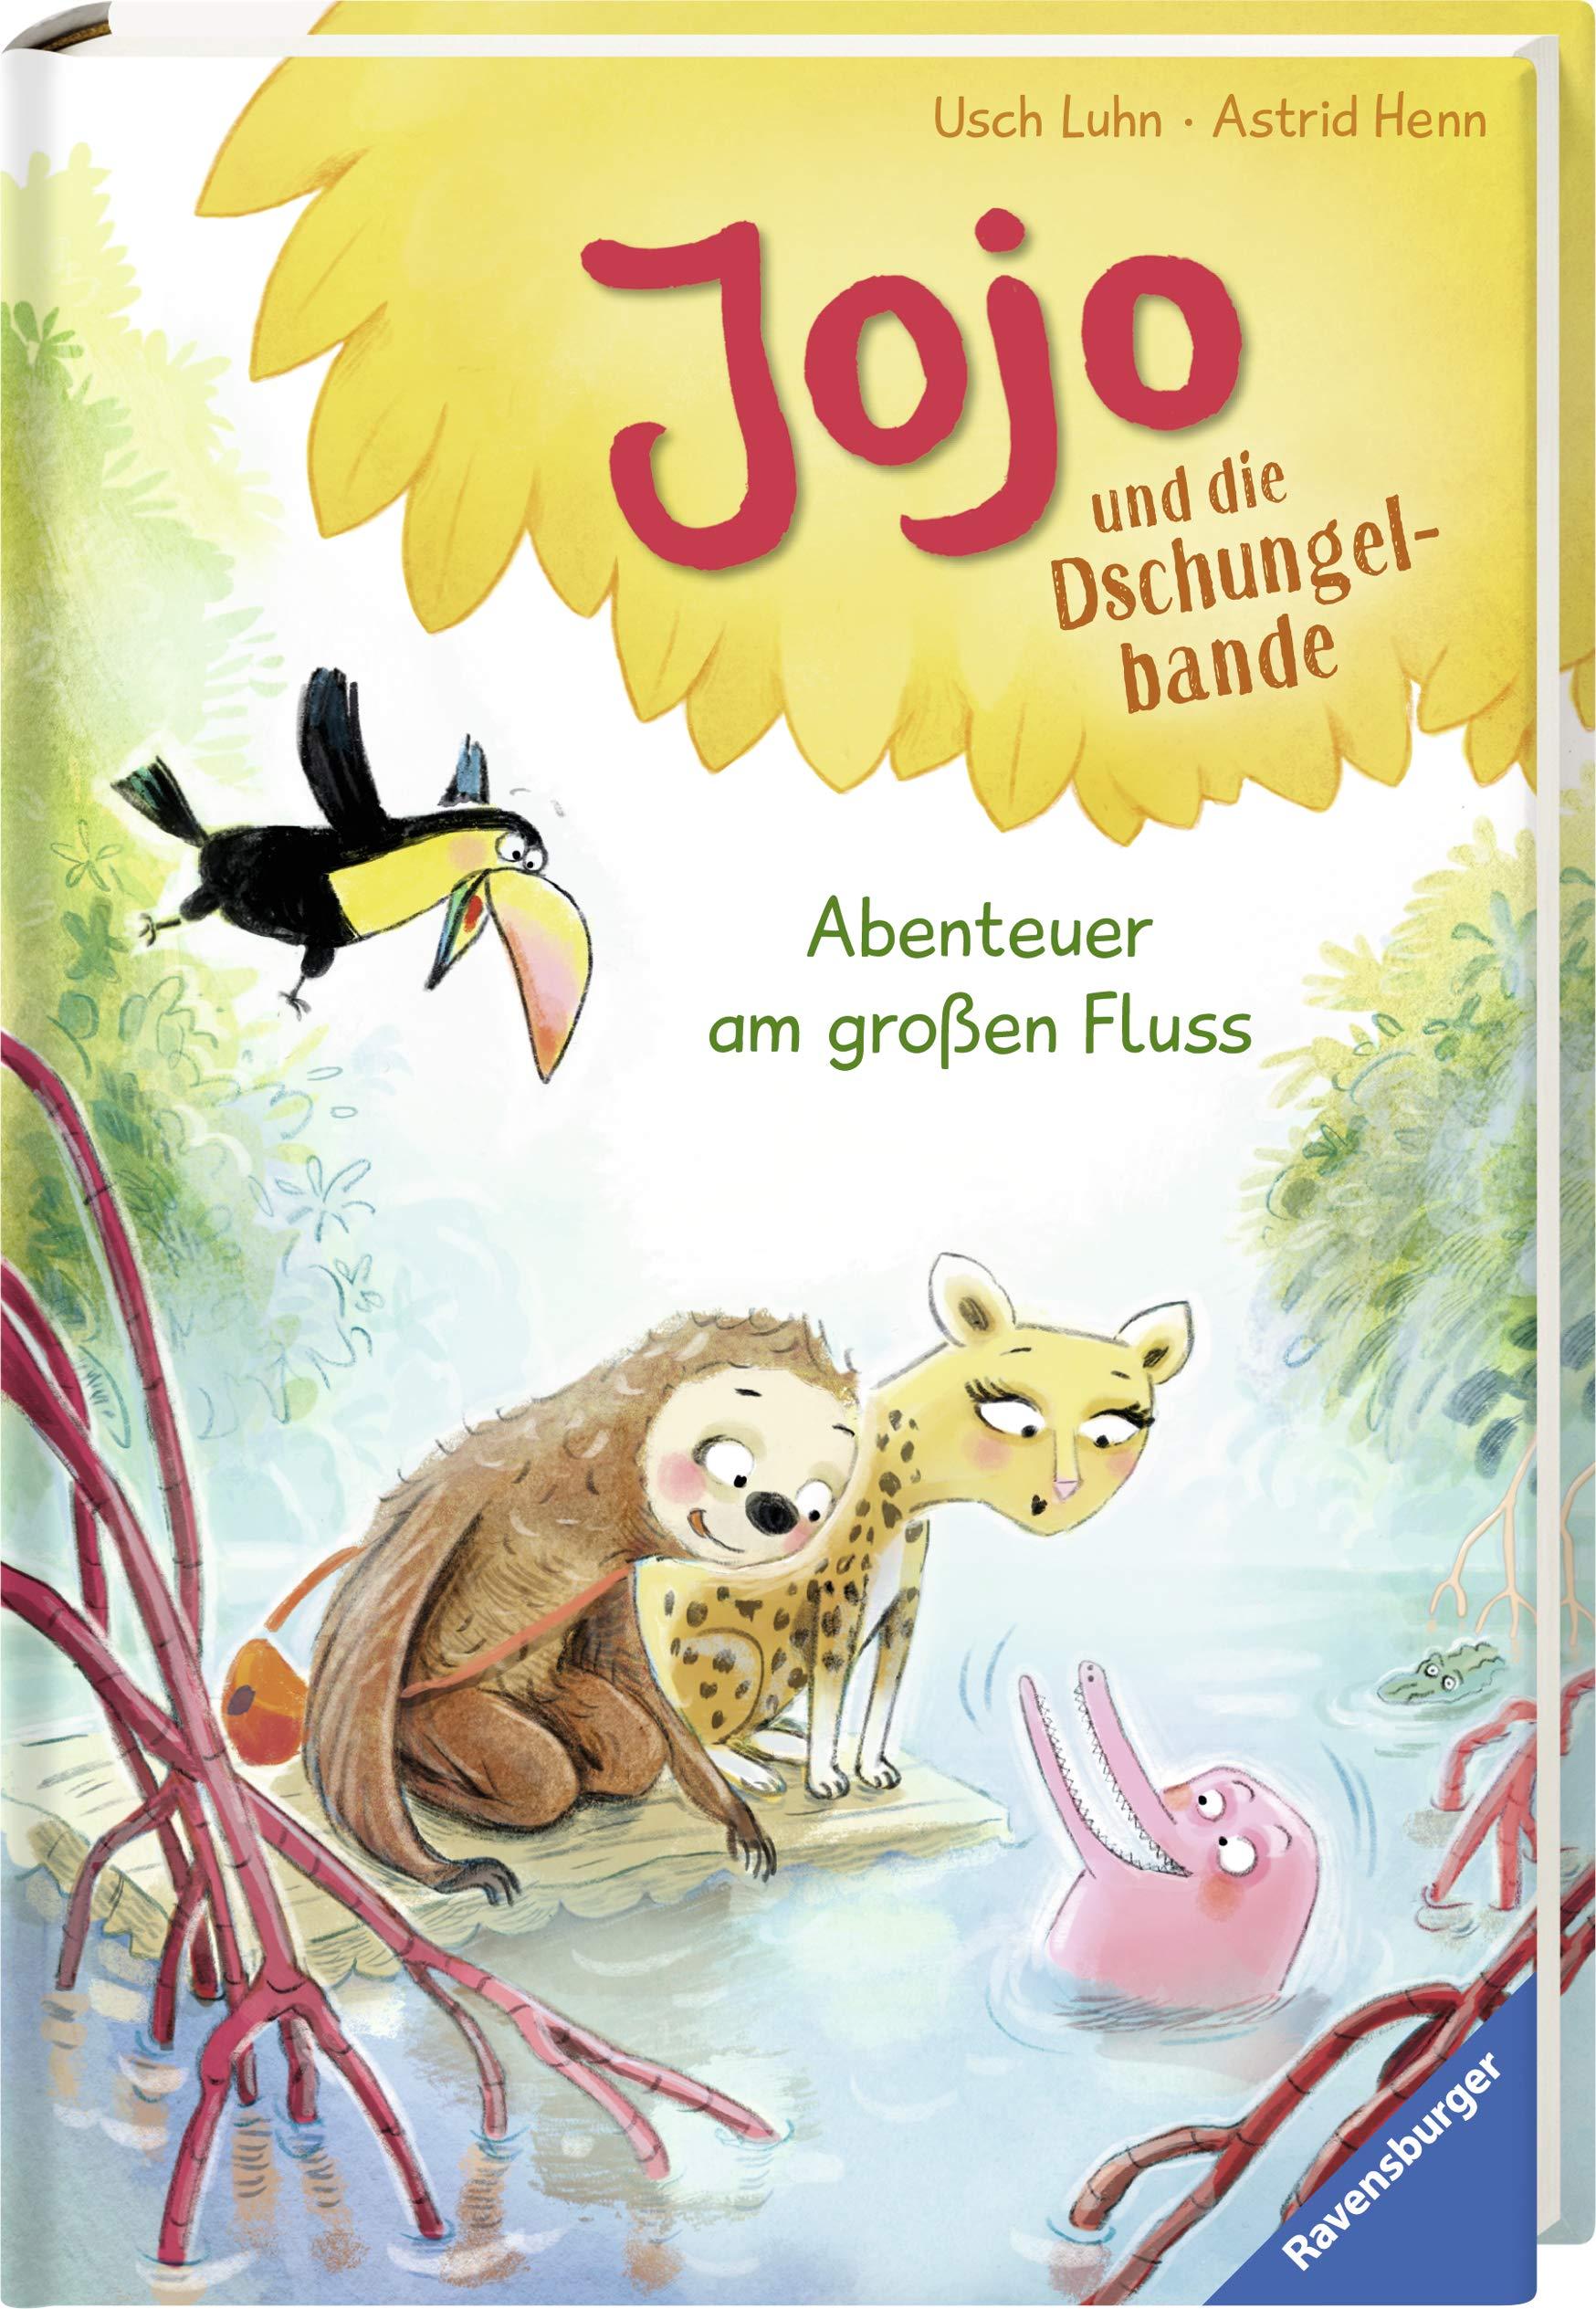 Jojo Und Die Dschungelbande Band 2 Abenteuer Am Grossen Fluss Erstleser Amazon De Luhn Usch Henn Astrid Bucher